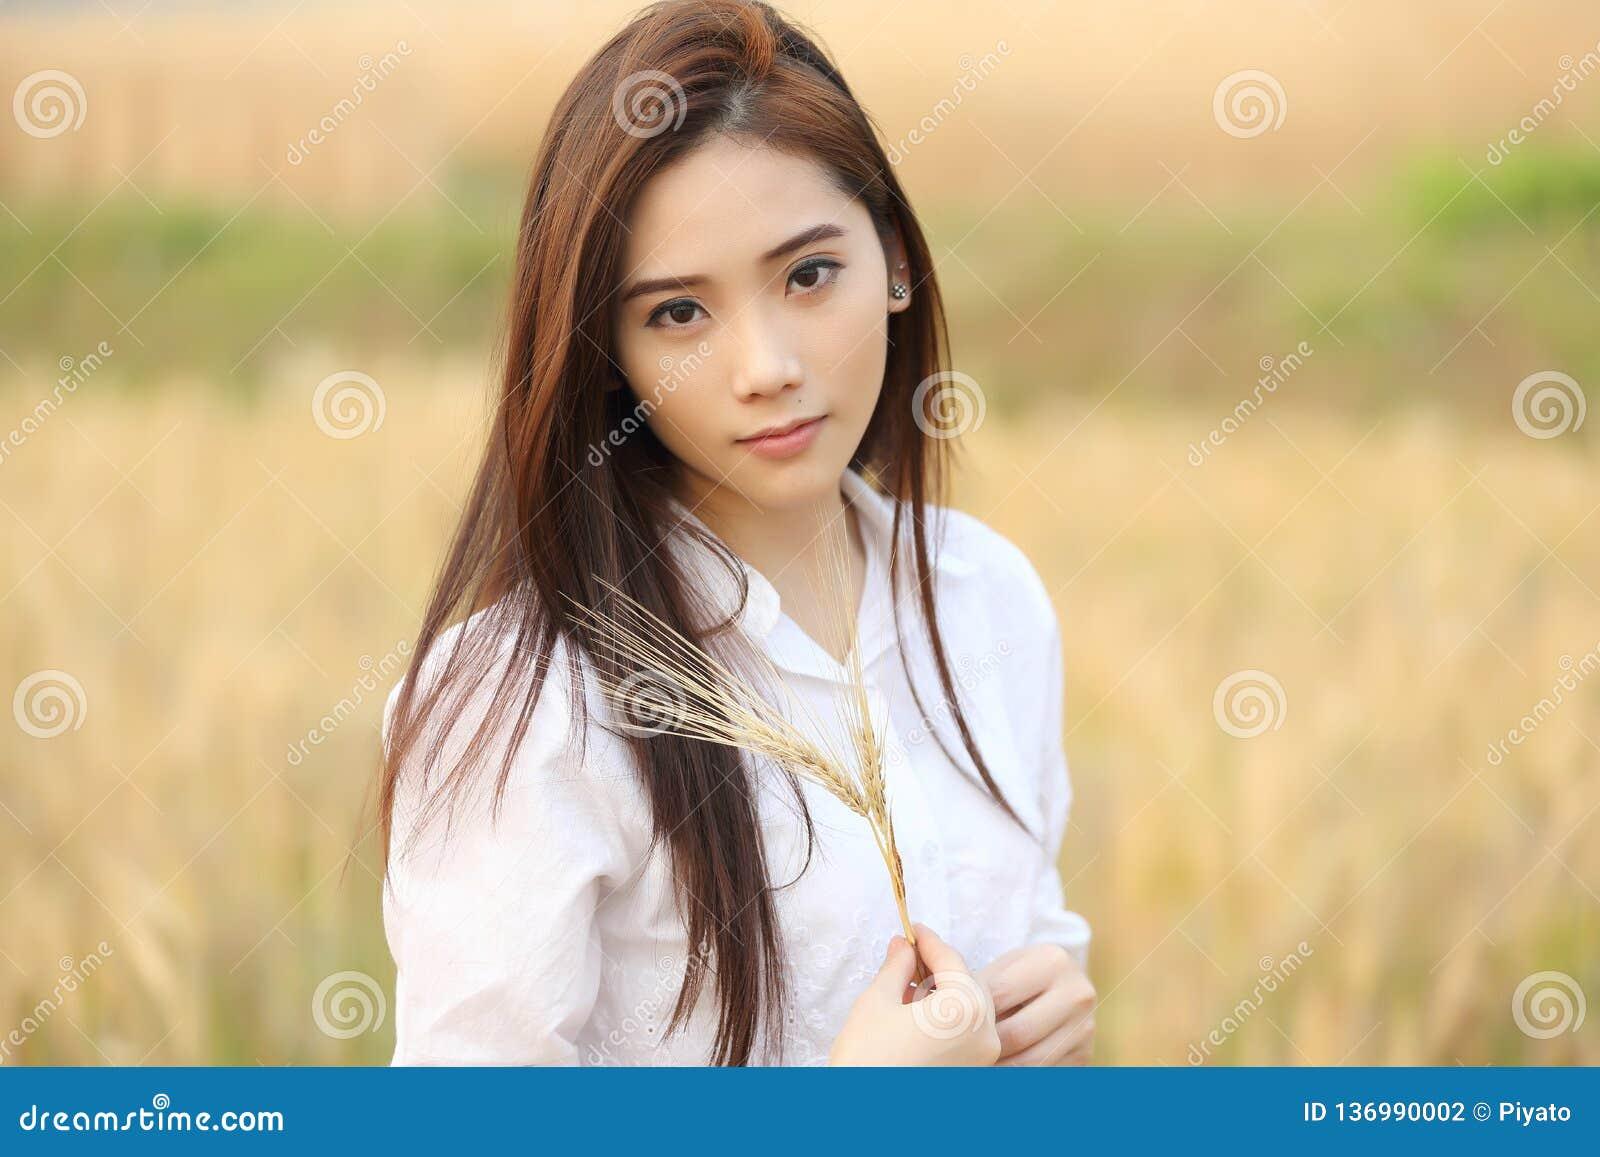 Asian girl at wheat field